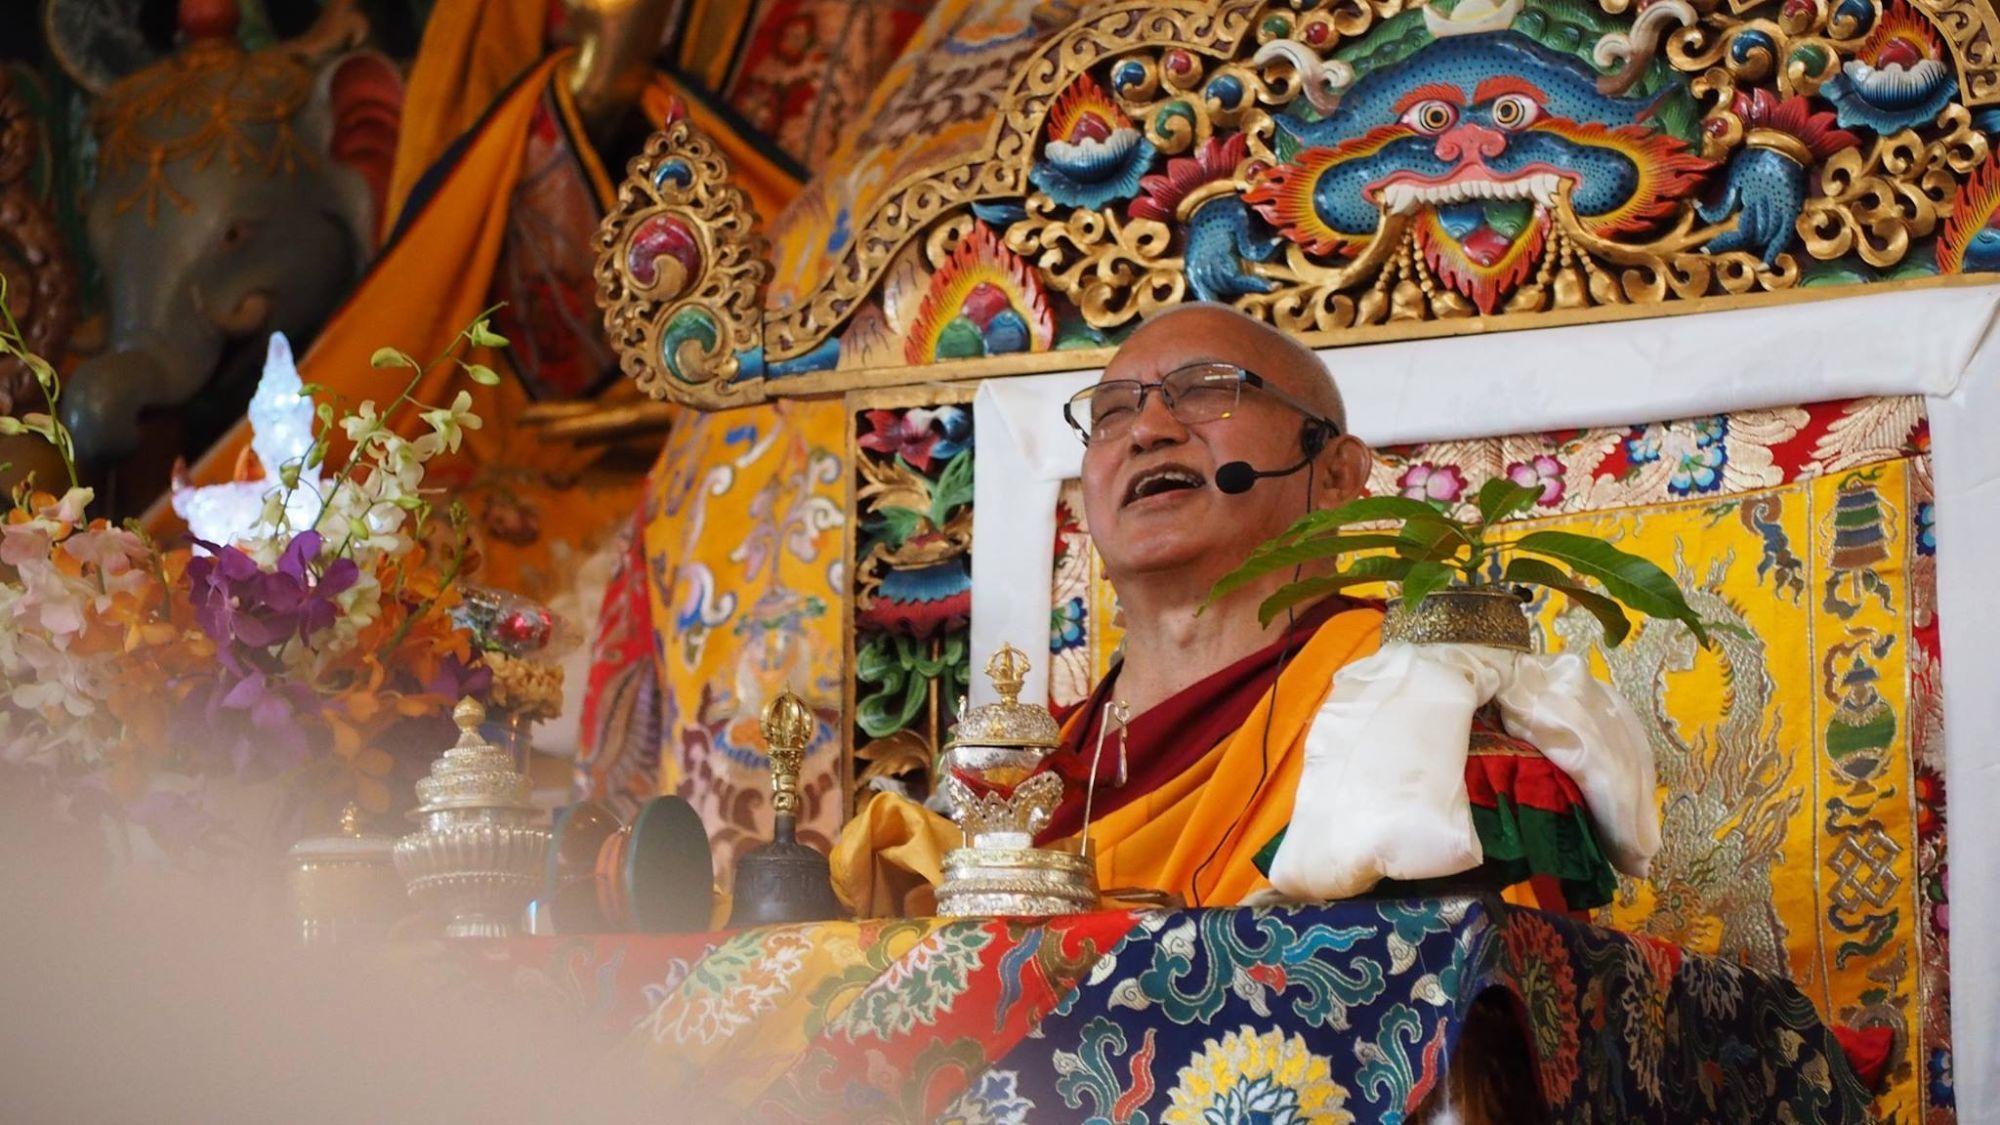 Lama Zopa Rinpoche at Kopan, Nepal, 2017. (Photo Ven Tenzin Tsultrim)